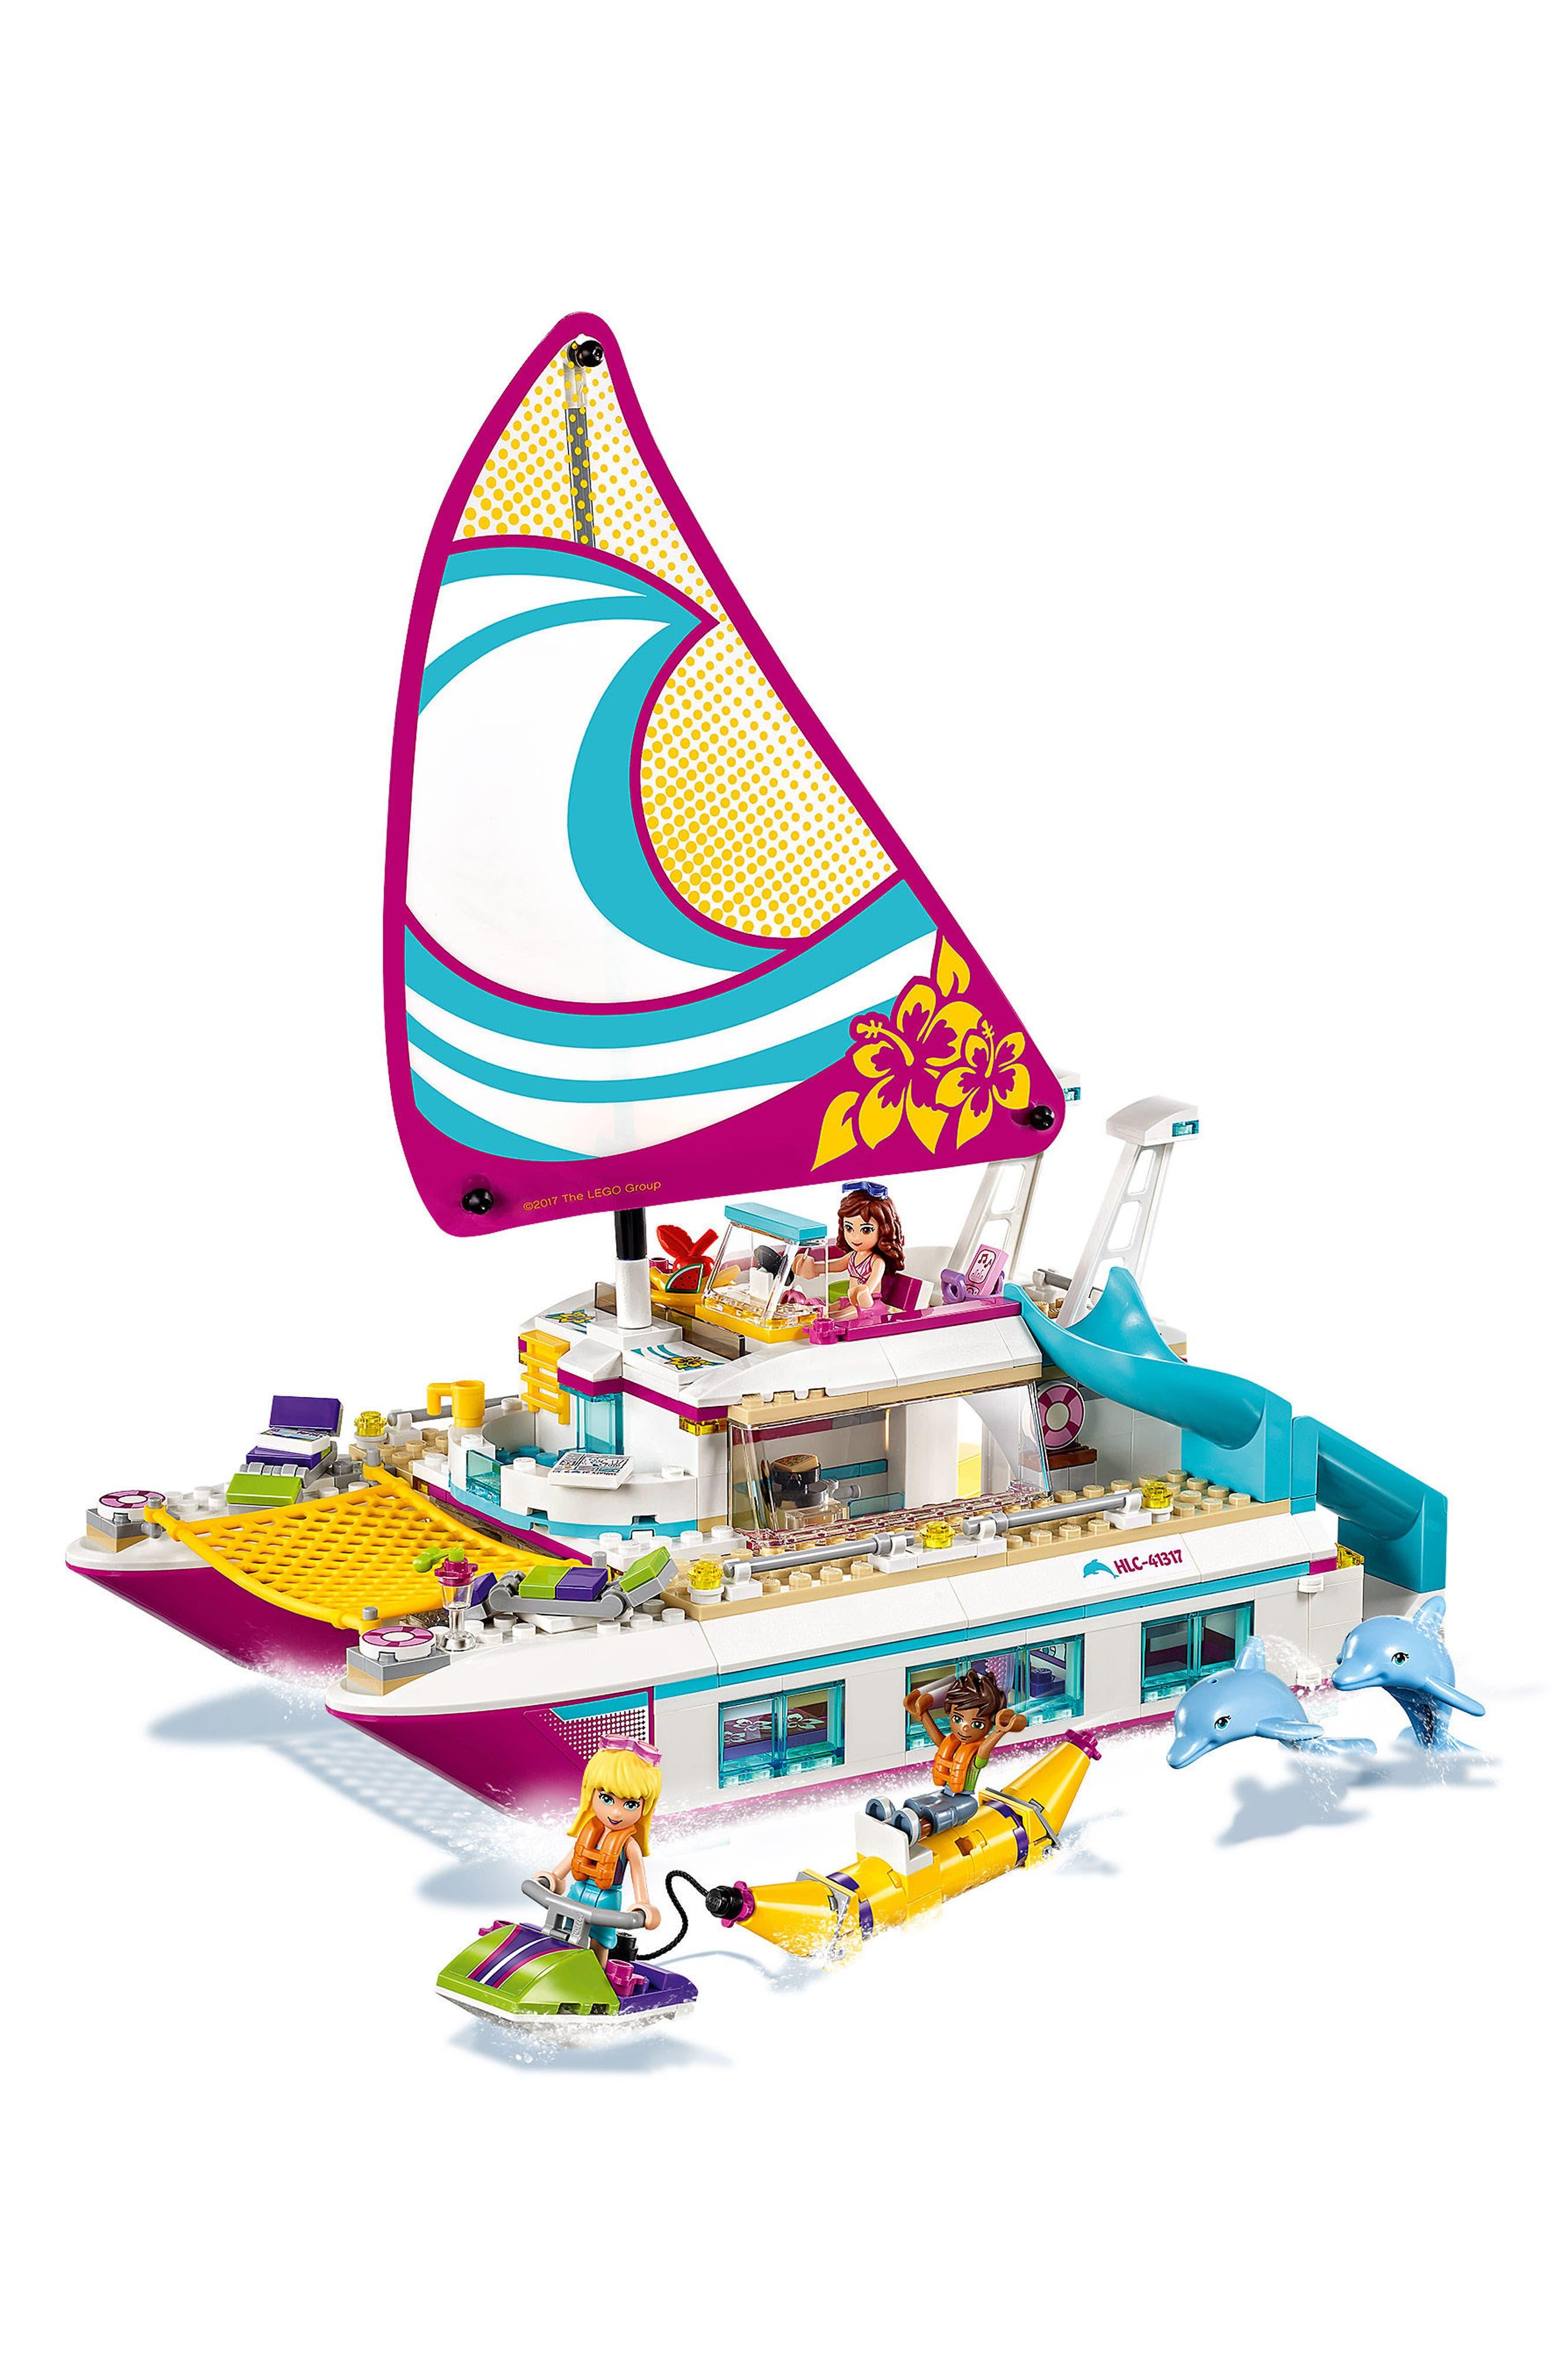 Sunshine Catamaran Play Set - 41317,                             Alternate thumbnail 4, color,                             650